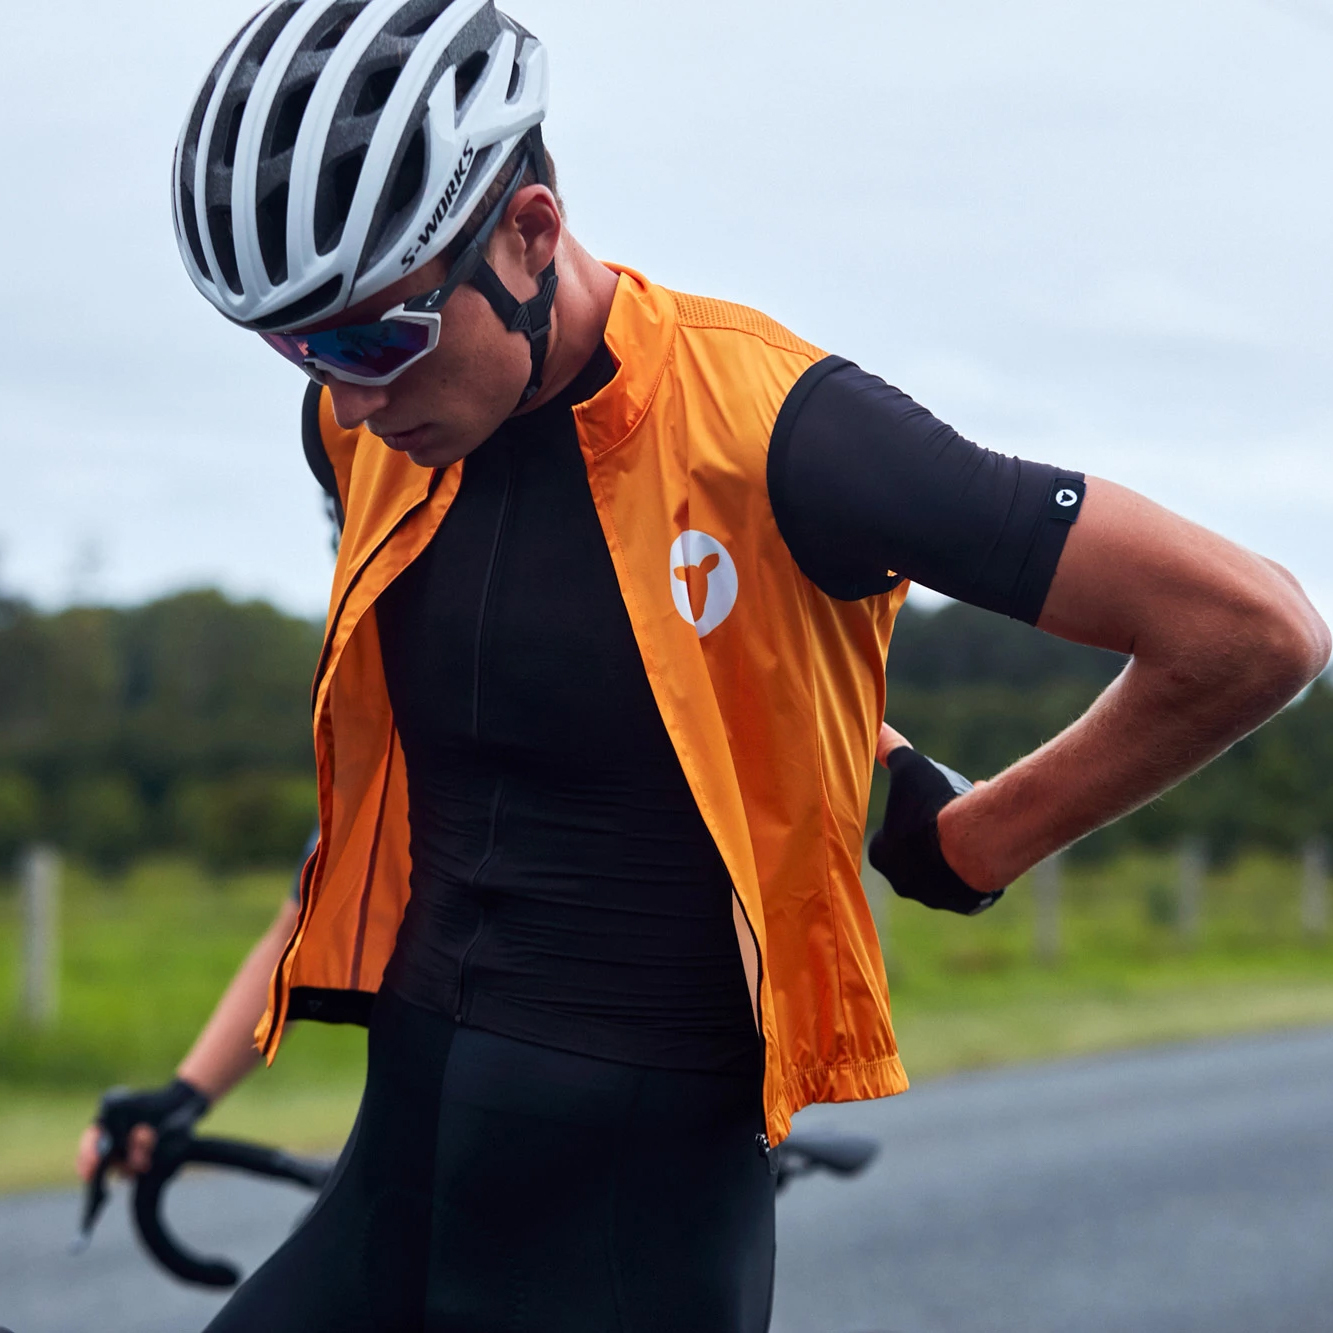 2019 Black Sheep Autumn Super Light Windproof Cycling GILET Men Or Women Cycling Windbreak Vest Mtb Wind Vest With Back Pocket